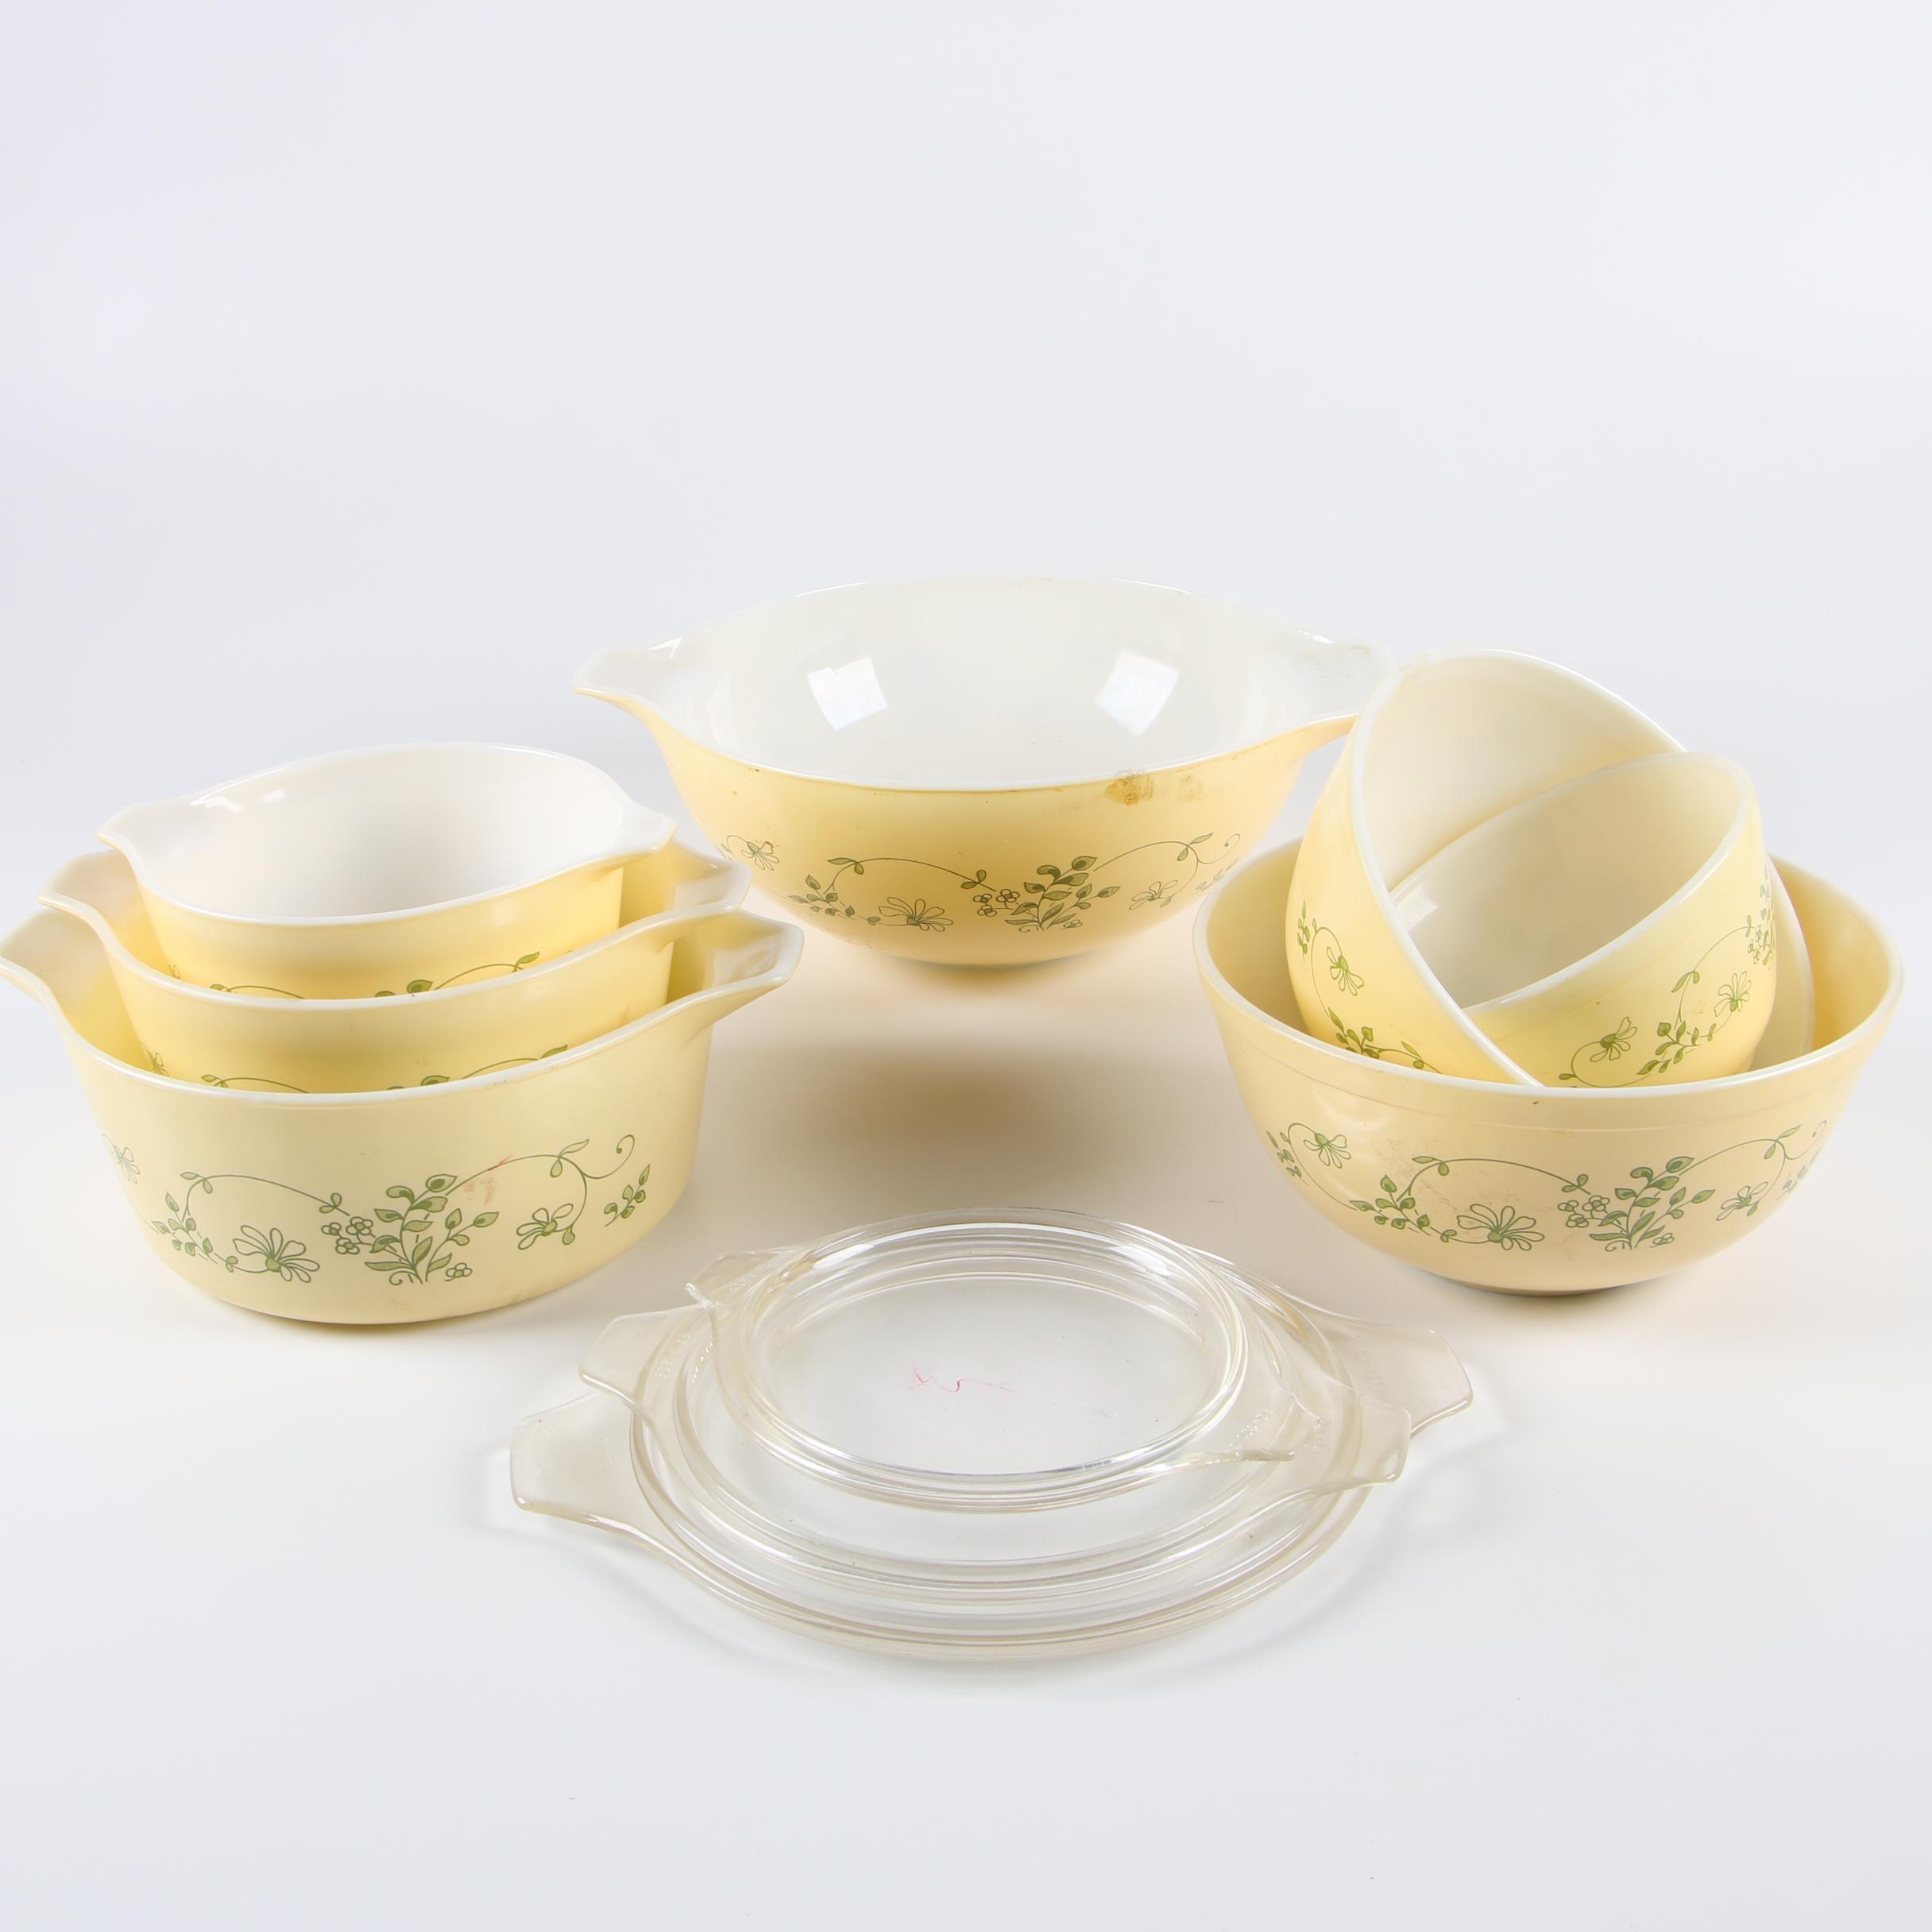 "Vintage Pyrex ""Shenandoah"" Cinderella and Nesting Bowls, Circa 1981-86"